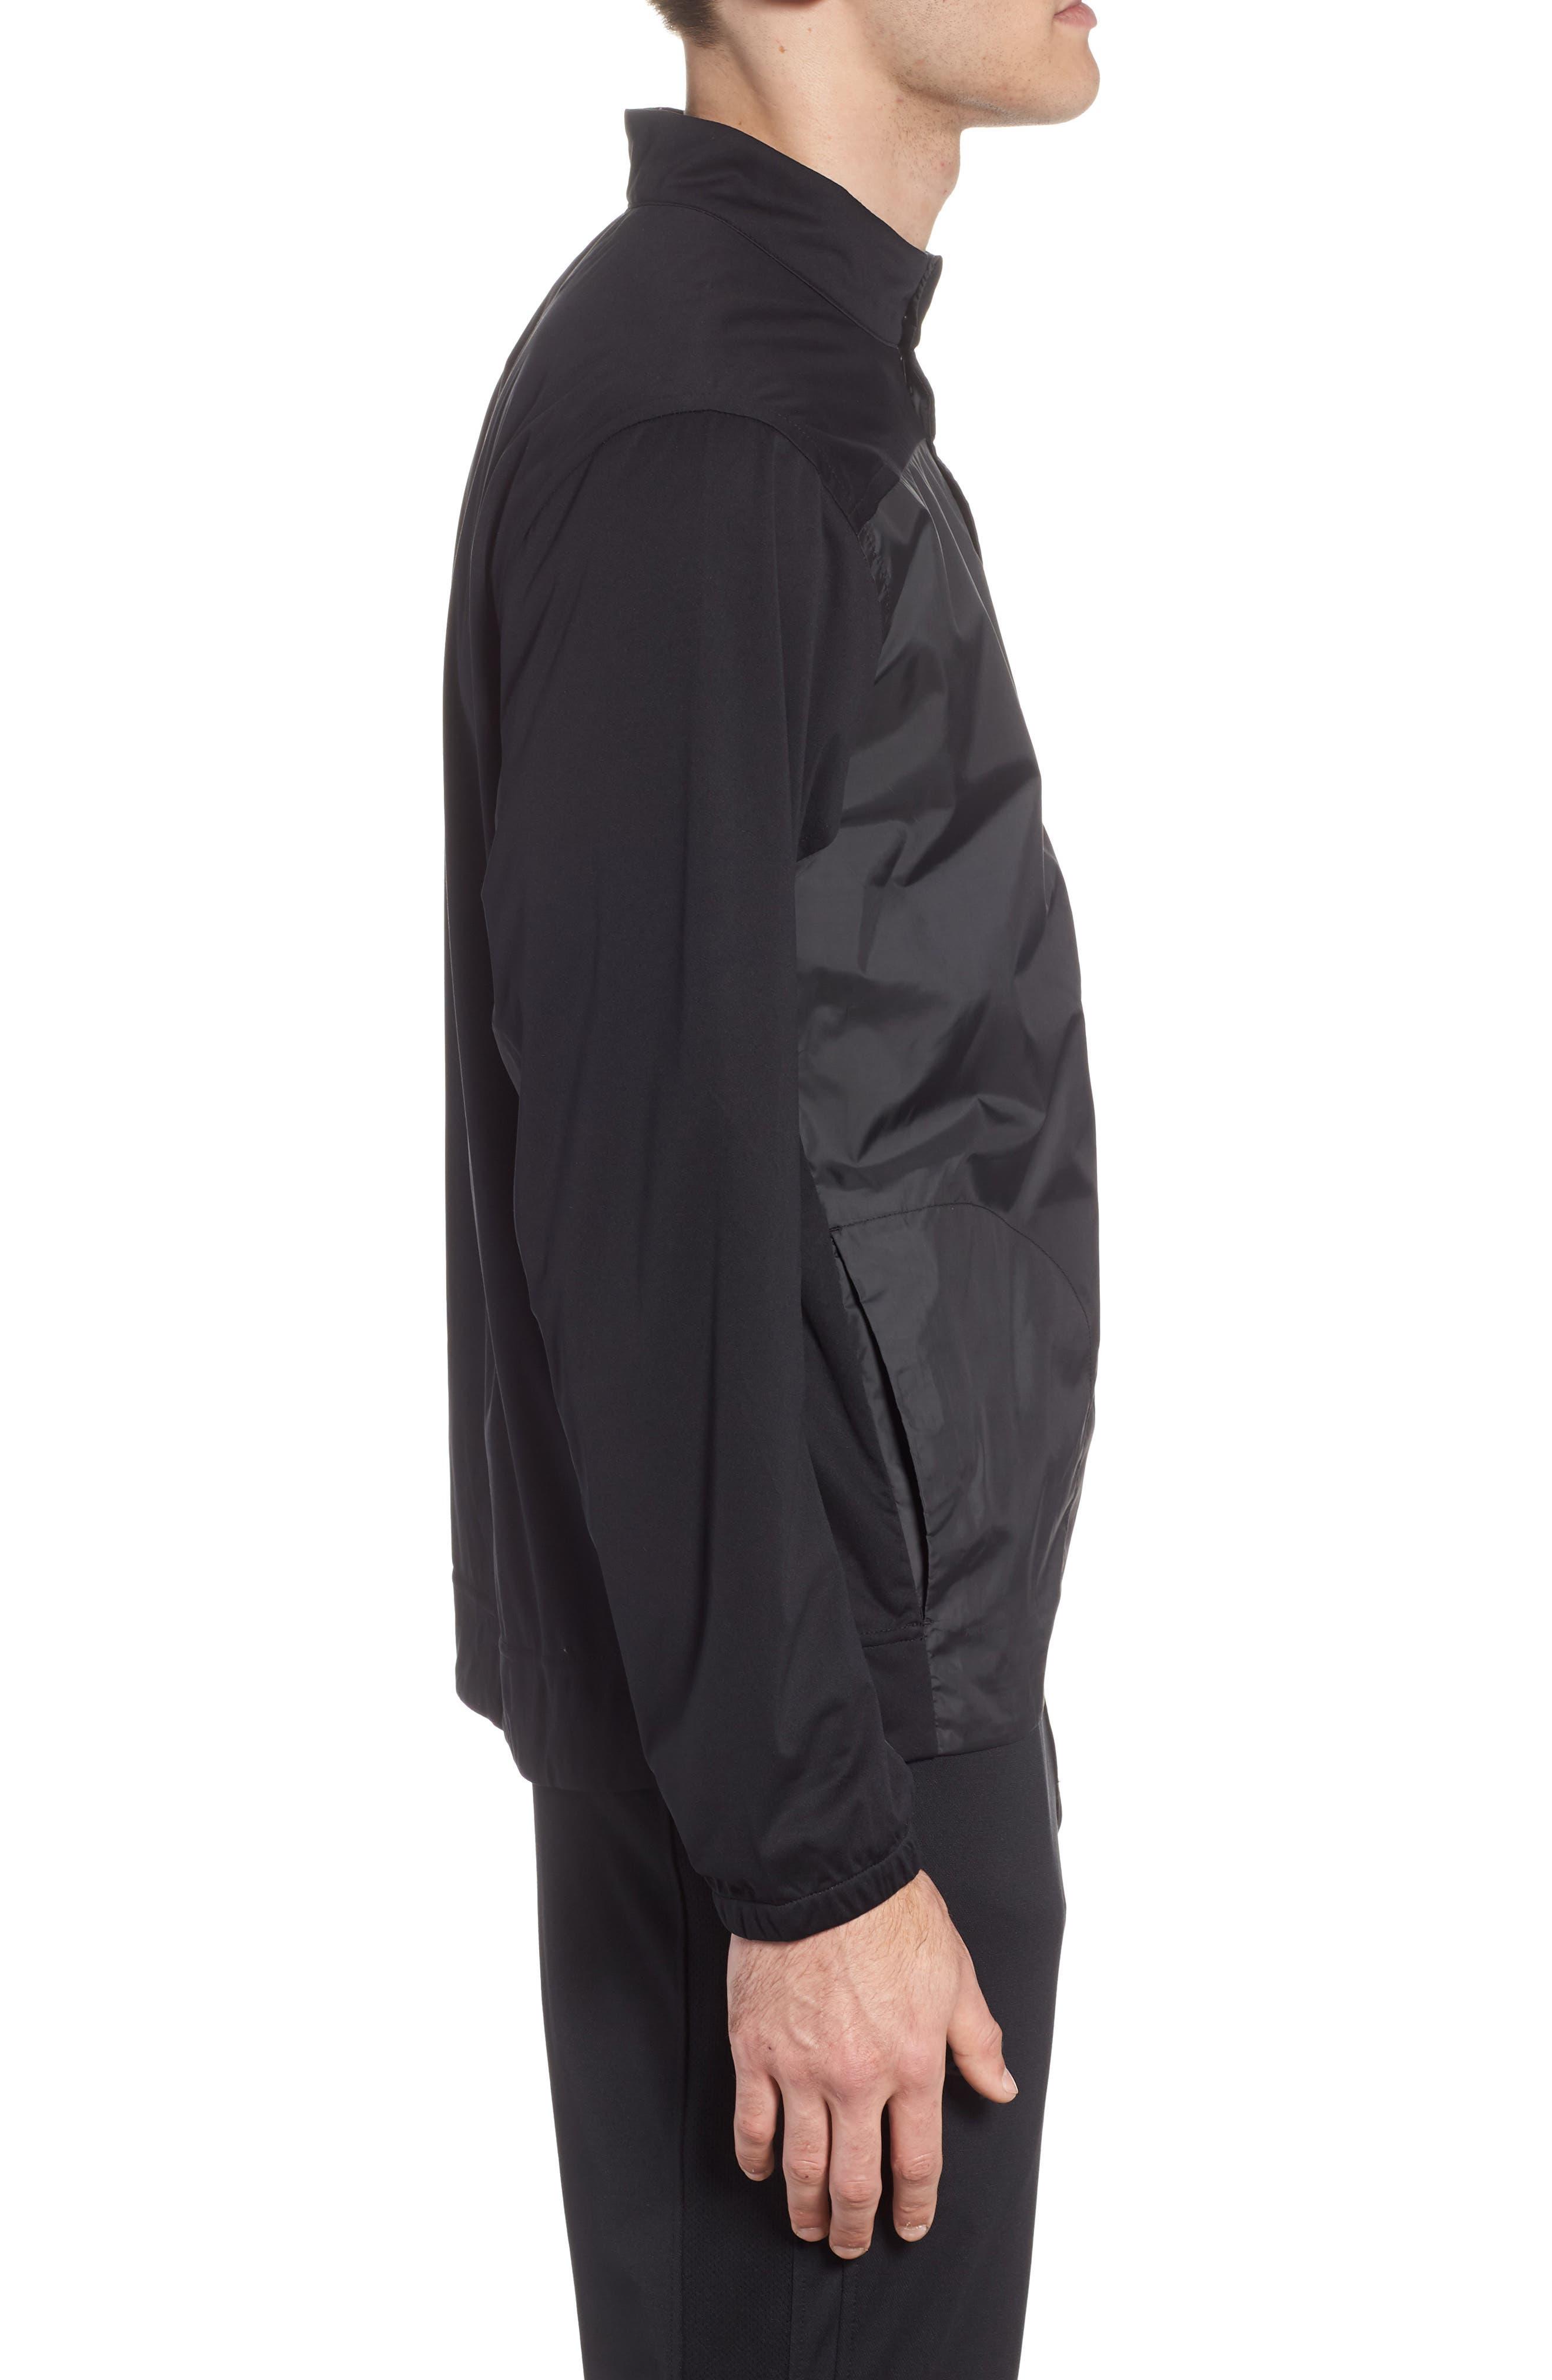 Shield Full Zip Golf Jacket,                             Alternate thumbnail 3, color,                             Black/ Silver